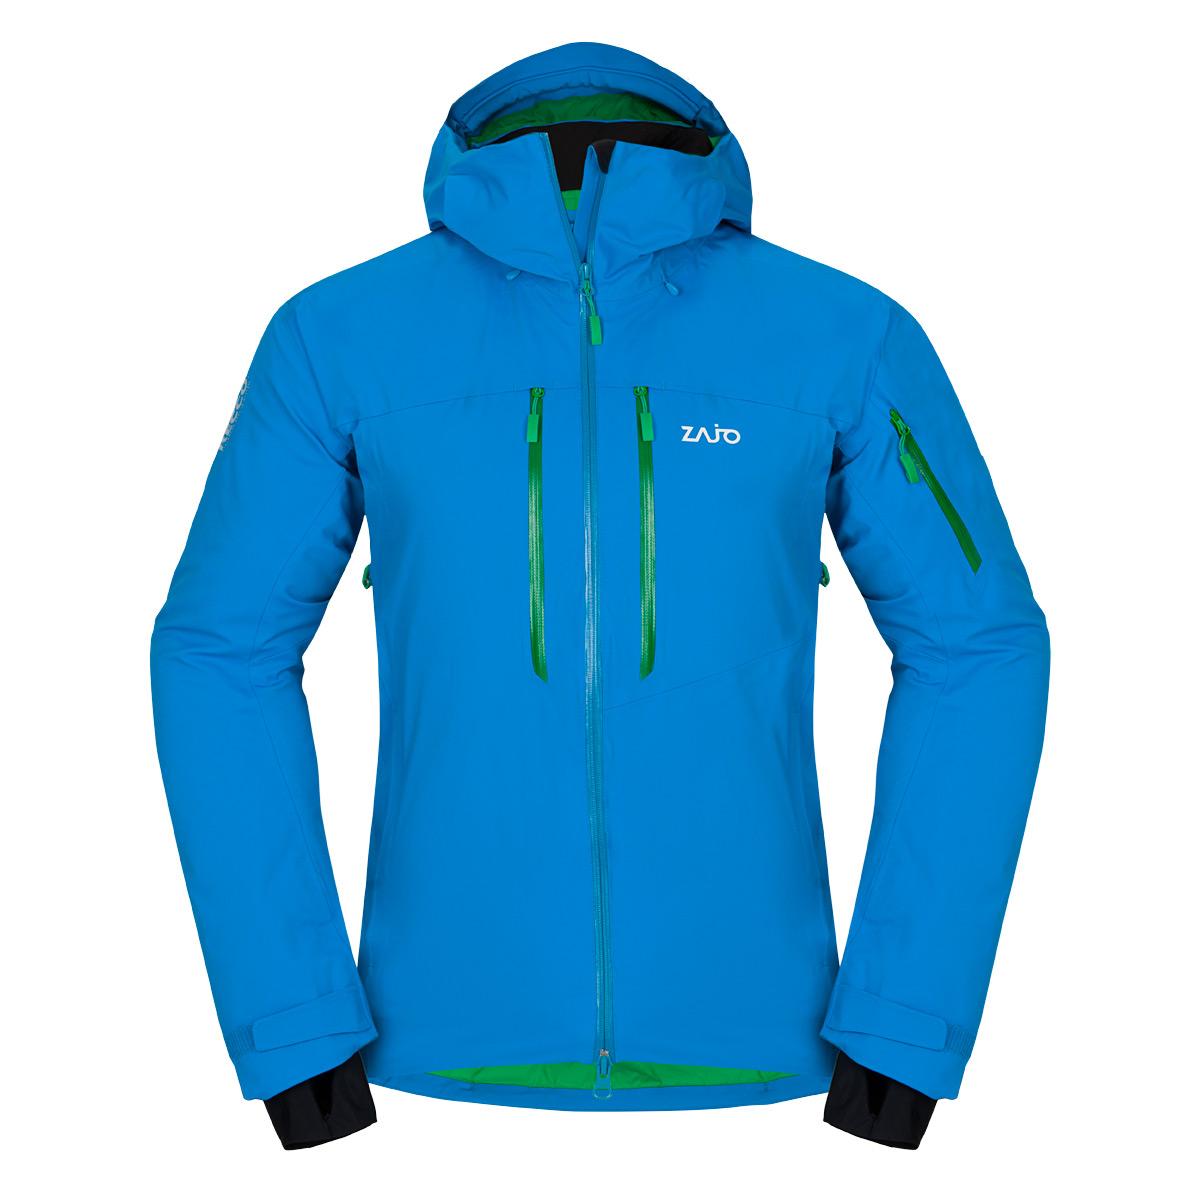 Pánska bunda Zajo Nuuk Neo JKT Blue Jewel - veľkosť M